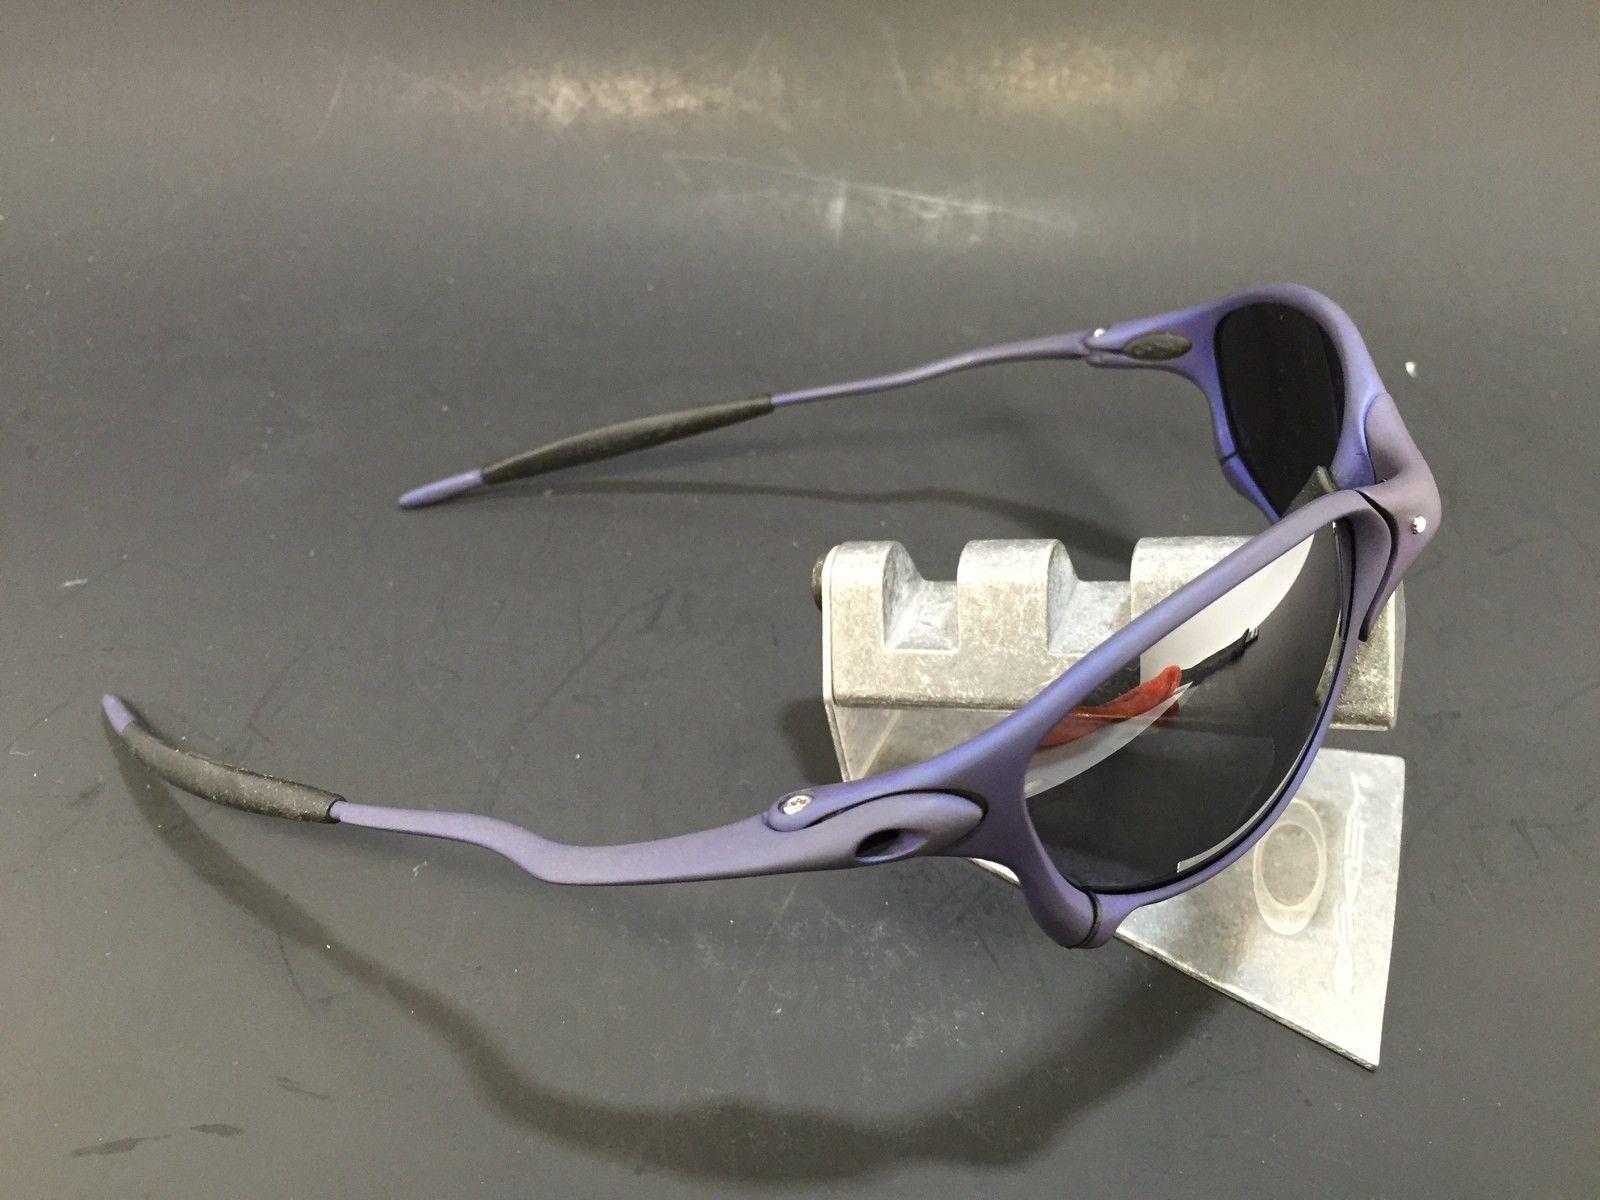 Anodized Purple X-Metal Finish XX Frame w/ OEM New Black Lenses - IMG_1852.JPG